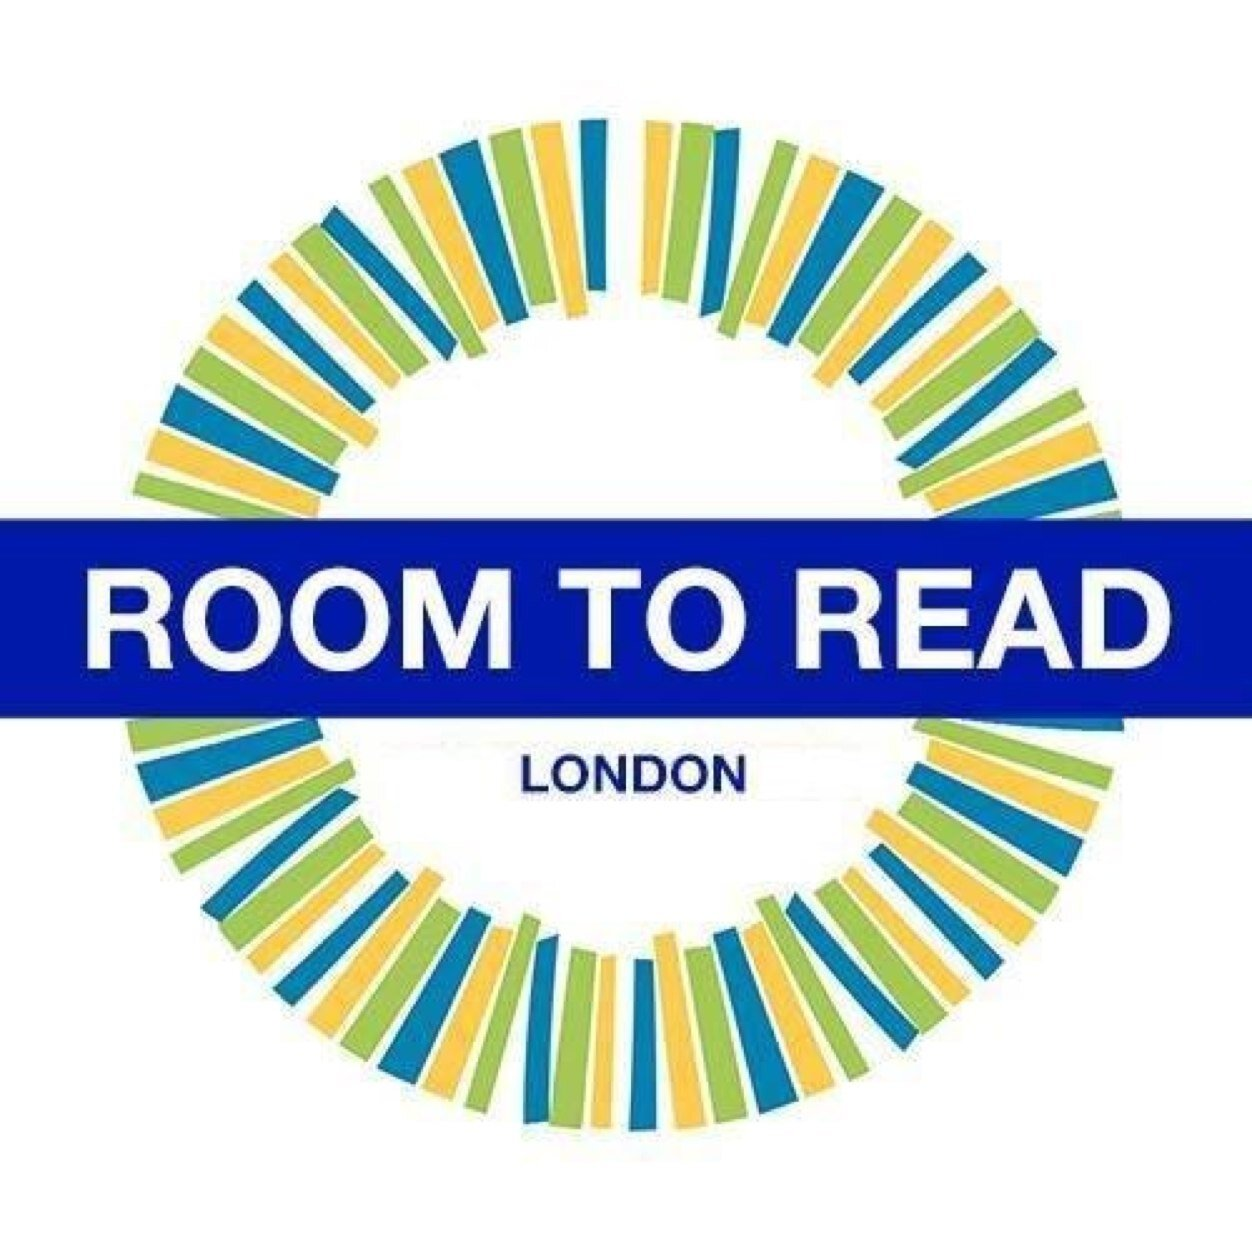 Room to Read London (@RoomtoRead_Lon) | Twitter